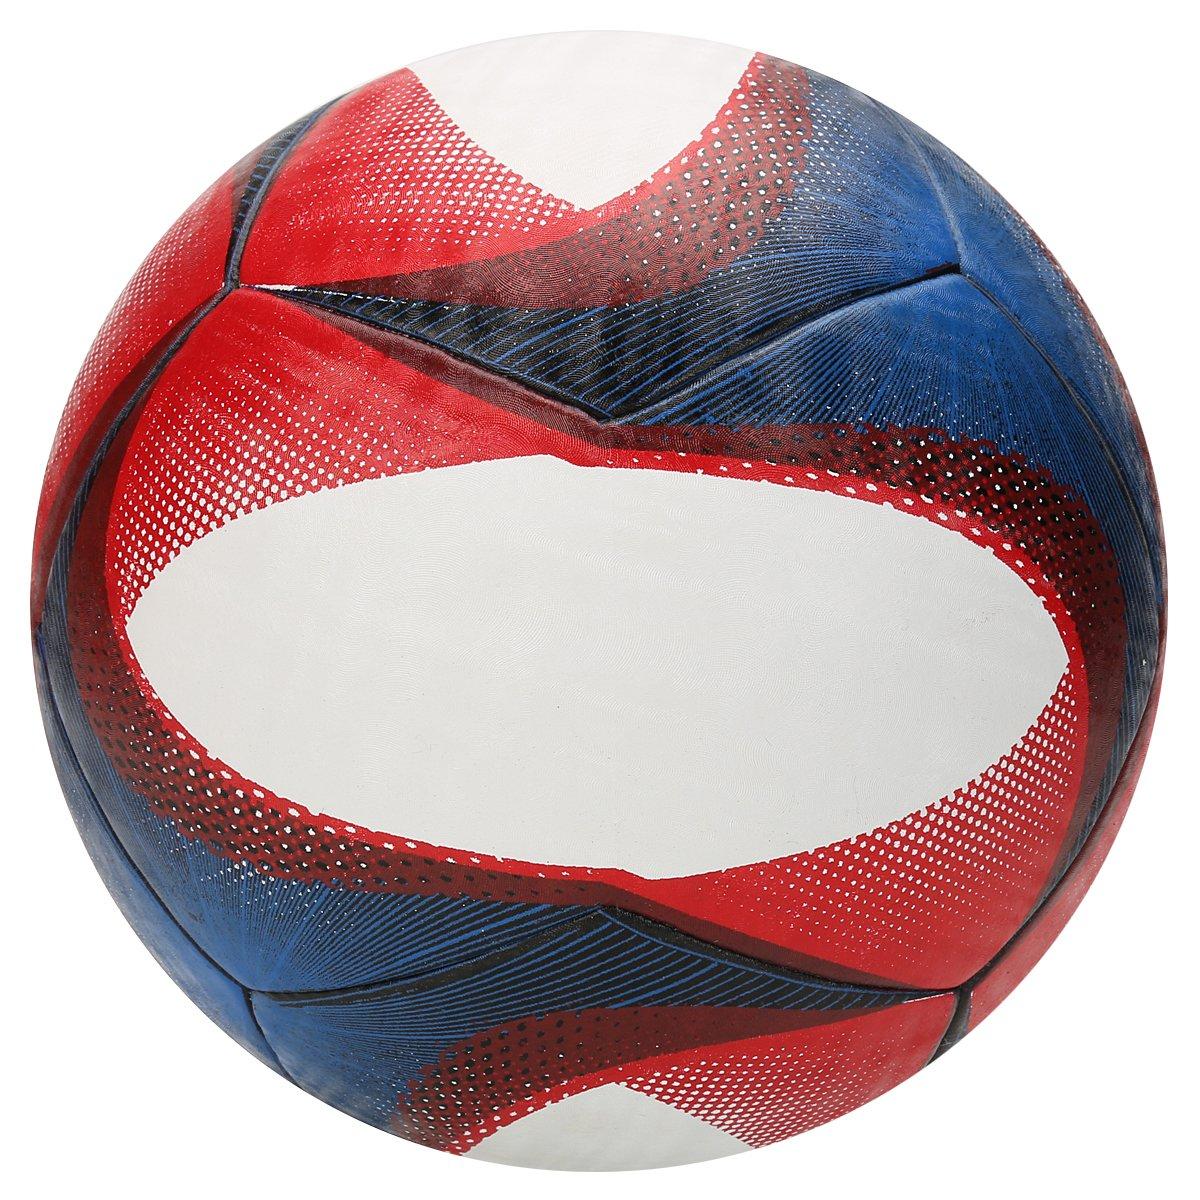 d456ba6ad2 Bola Futebol Topper Slick Futsal - Compre Agora